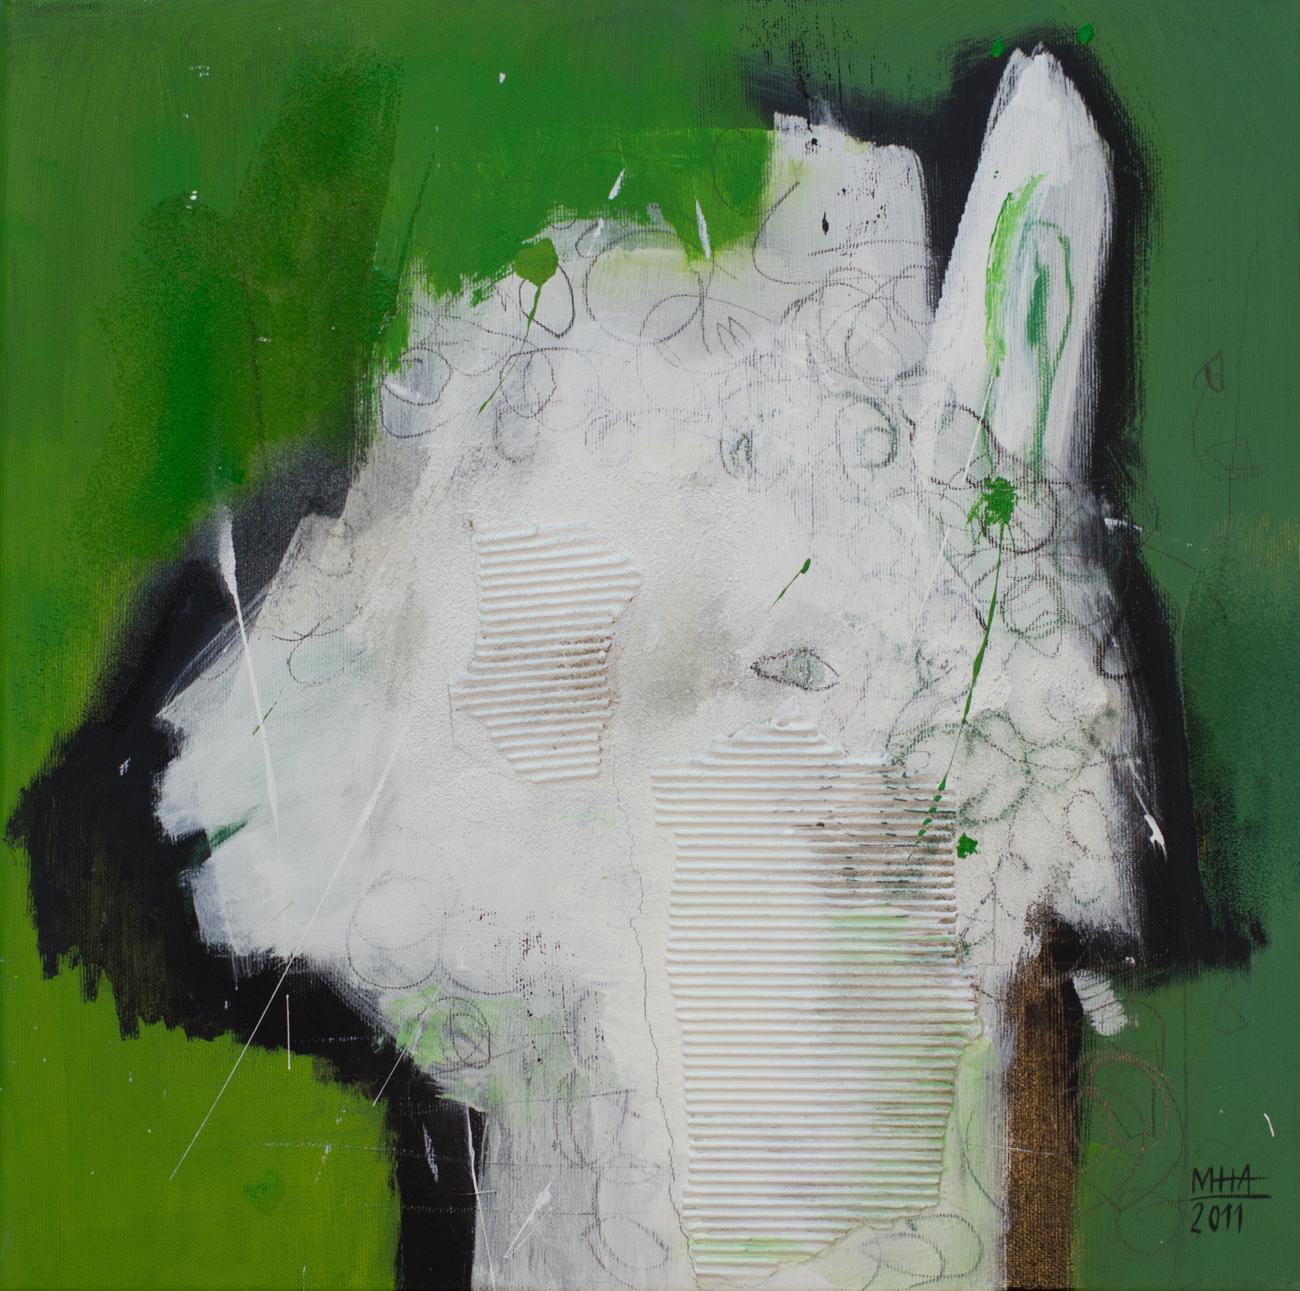 Kopf Nr. 9   , 2011, Acryl auf Leinwand – Mischtechnik , 40x40 cm